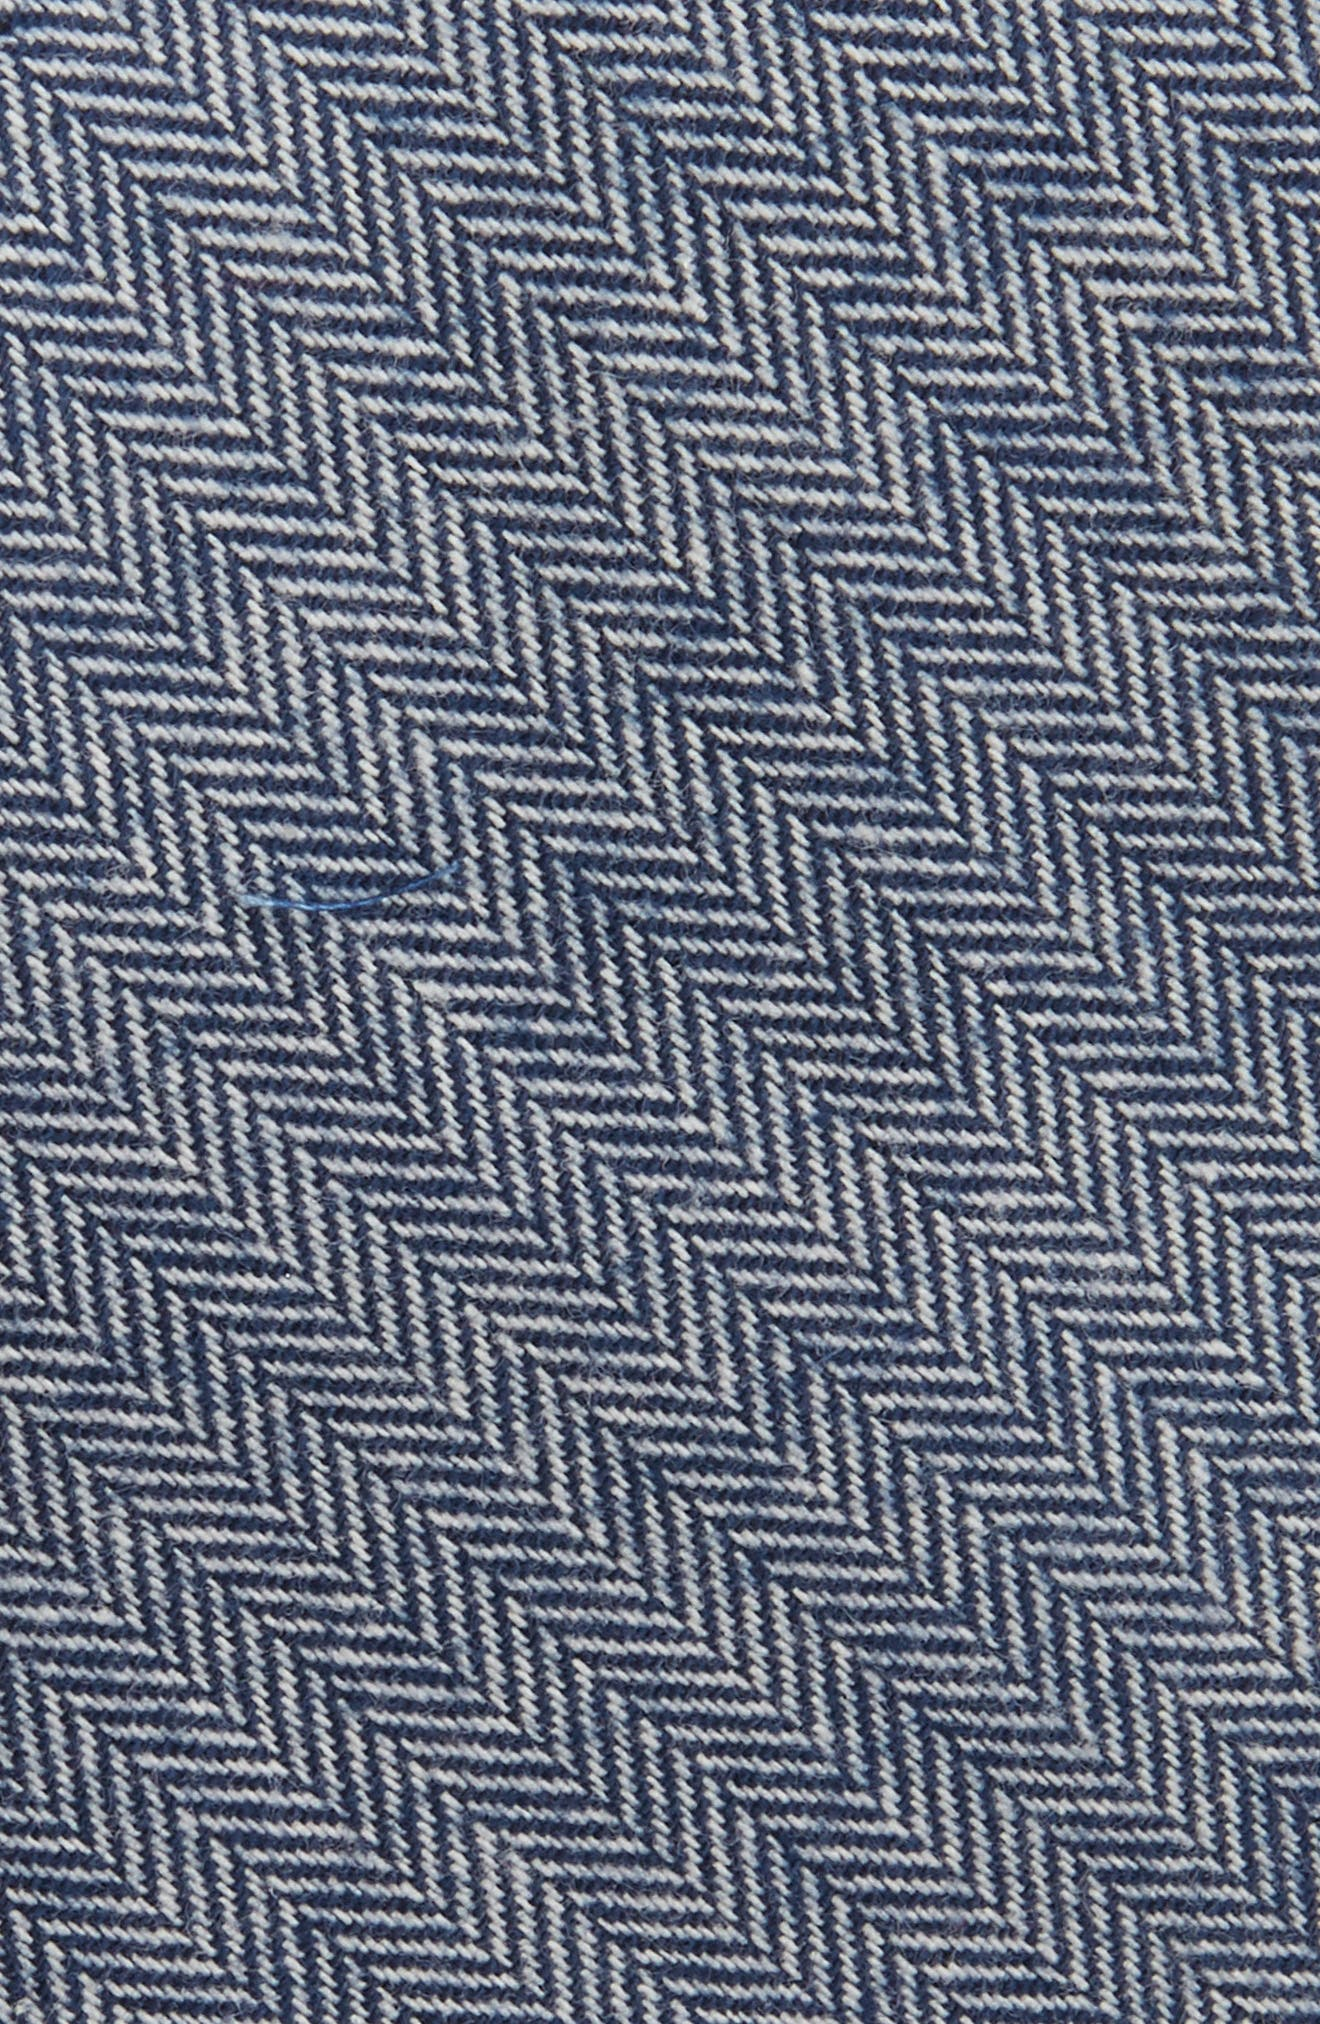 Herringbone Stretch Cotton Tie,                             Alternate thumbnail 2, color,                             410